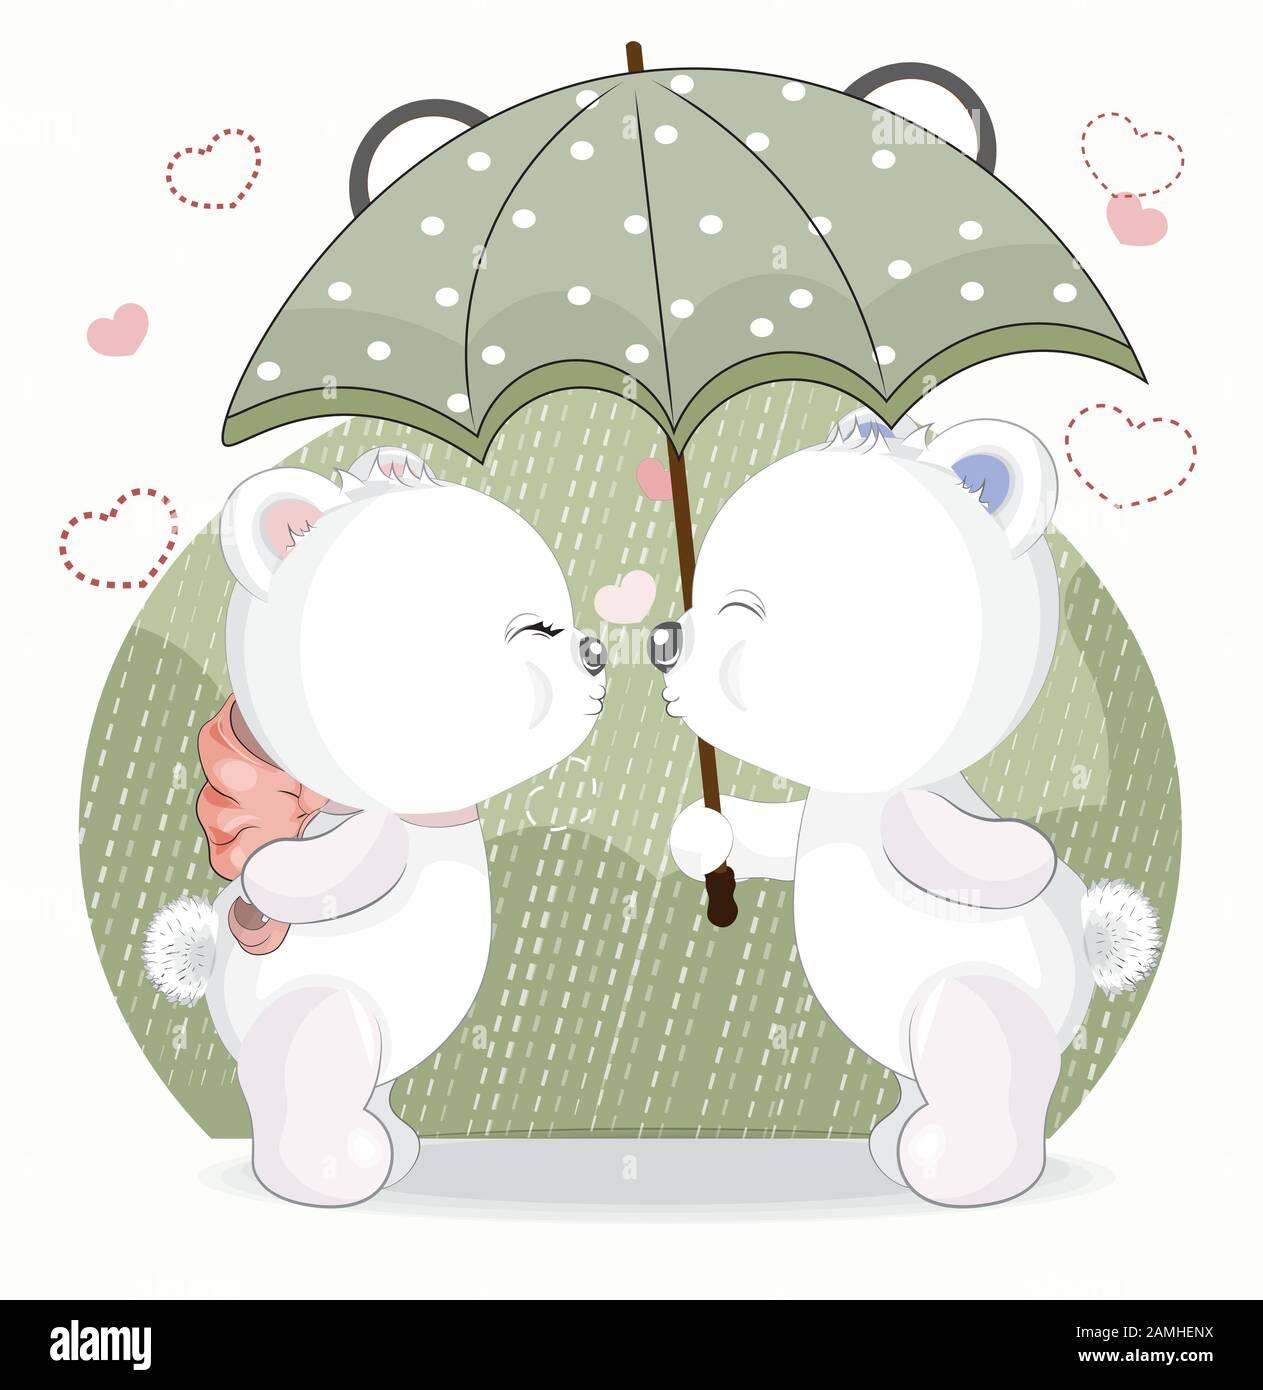 Beso En Amor White Girl And Boy Teddy Bear Bajo La Lluvia Cuadro